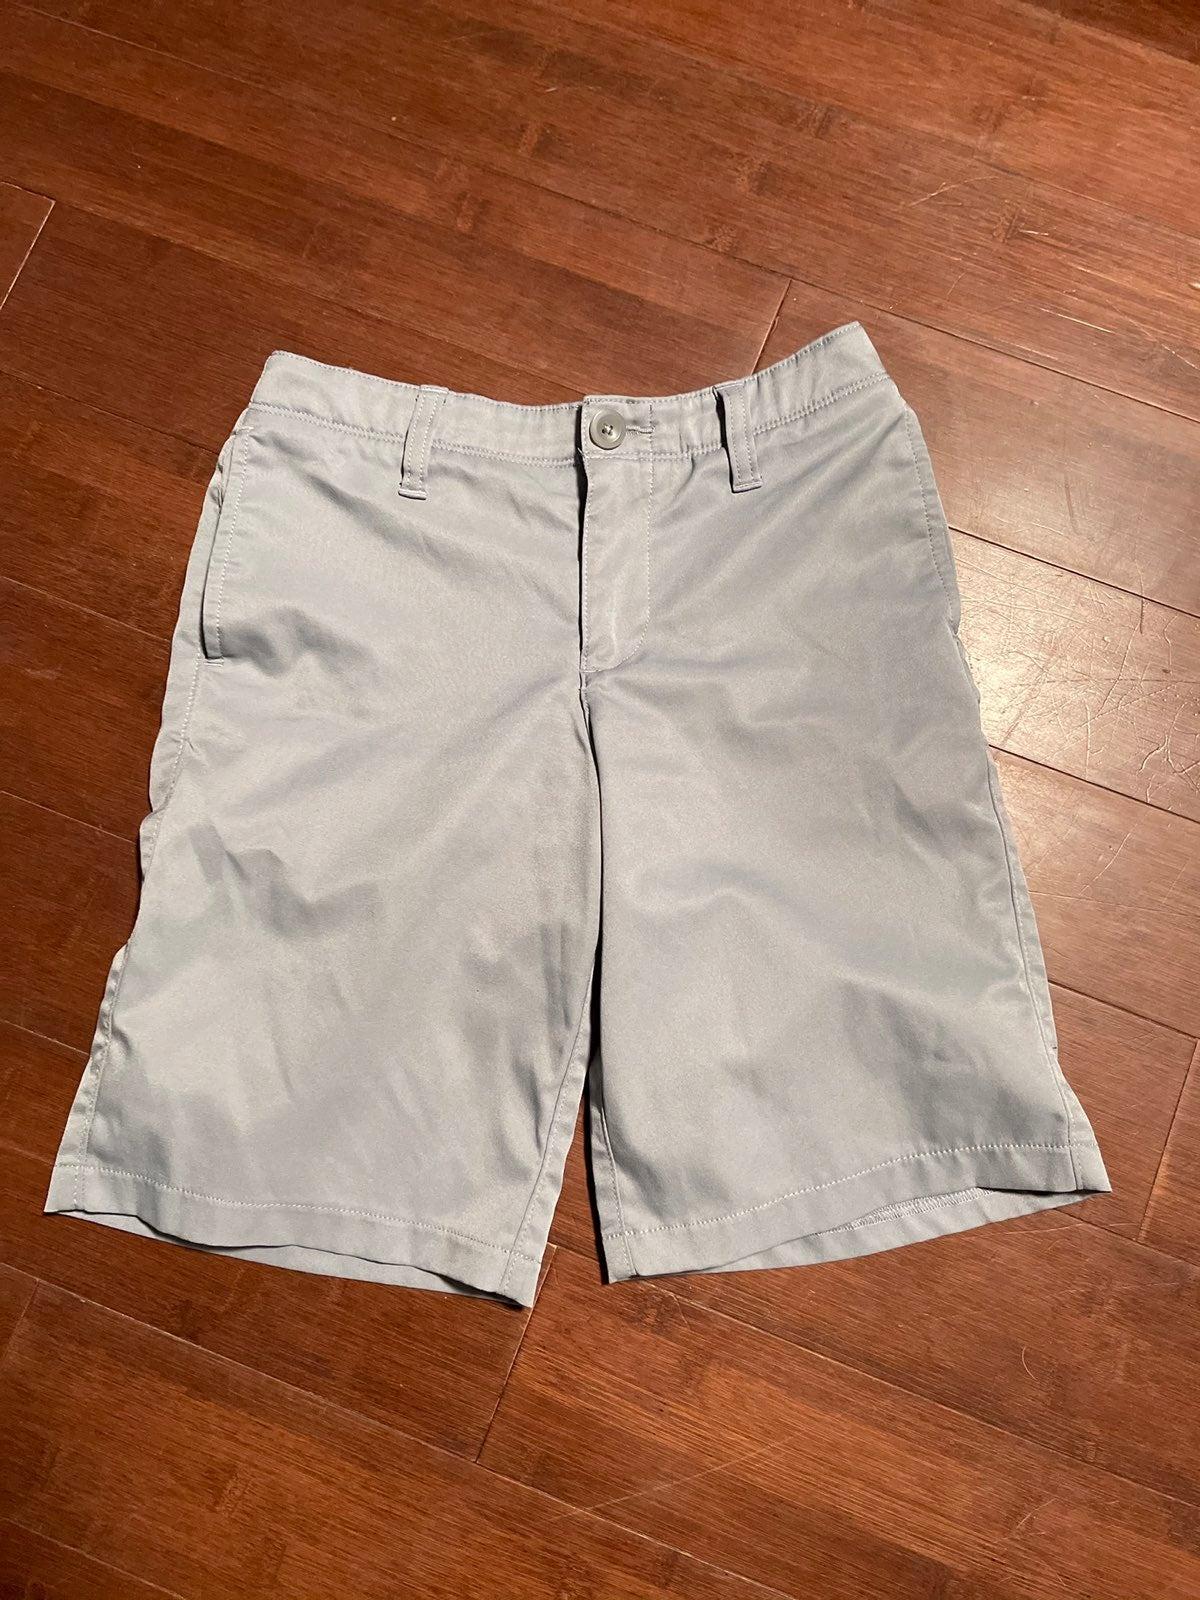 Under Armour grey shorts 10